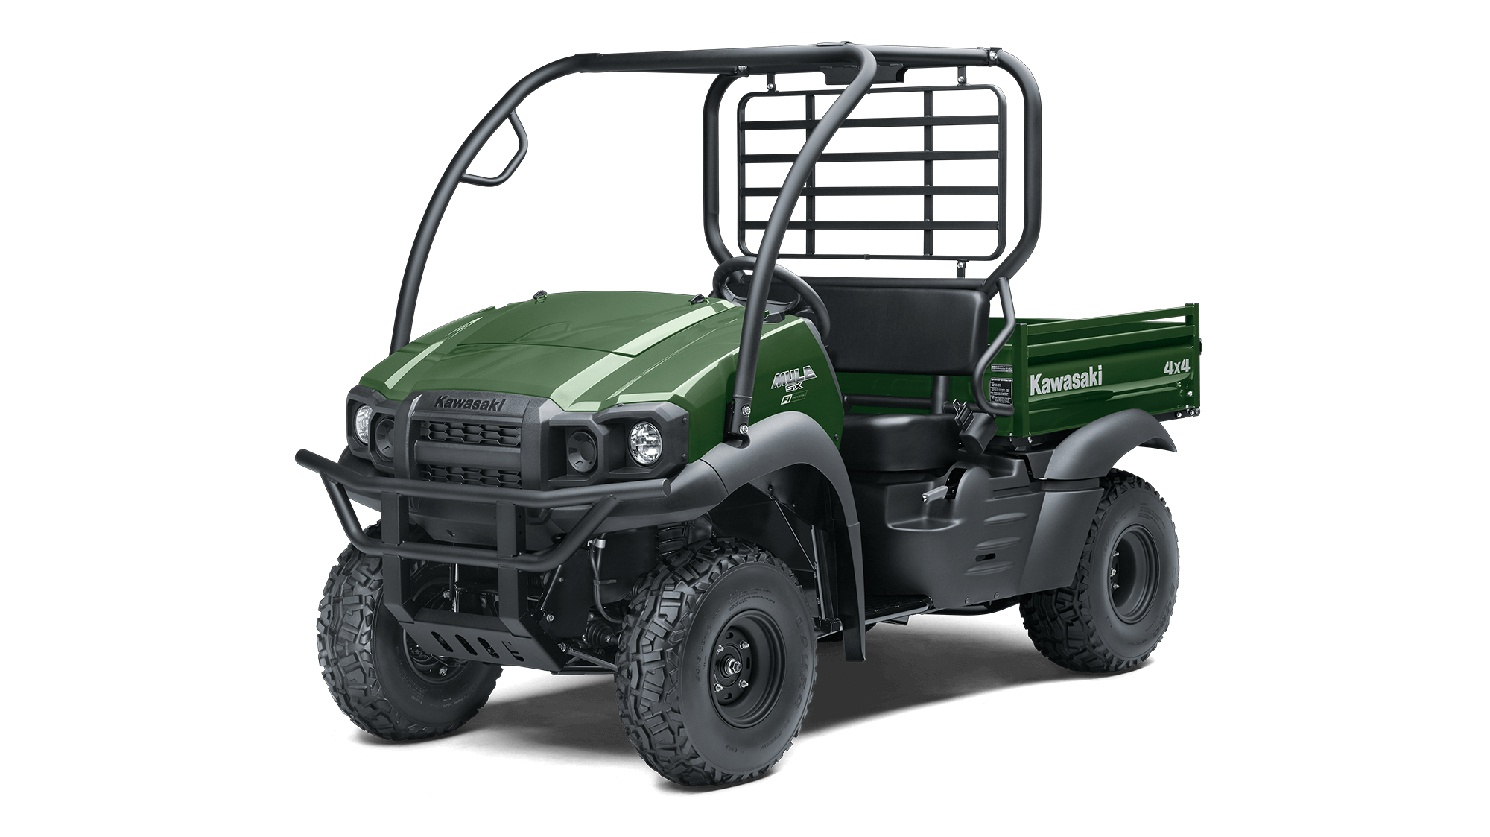 2021 Kawasaki MULE SX 4x4 FI Timberline Green